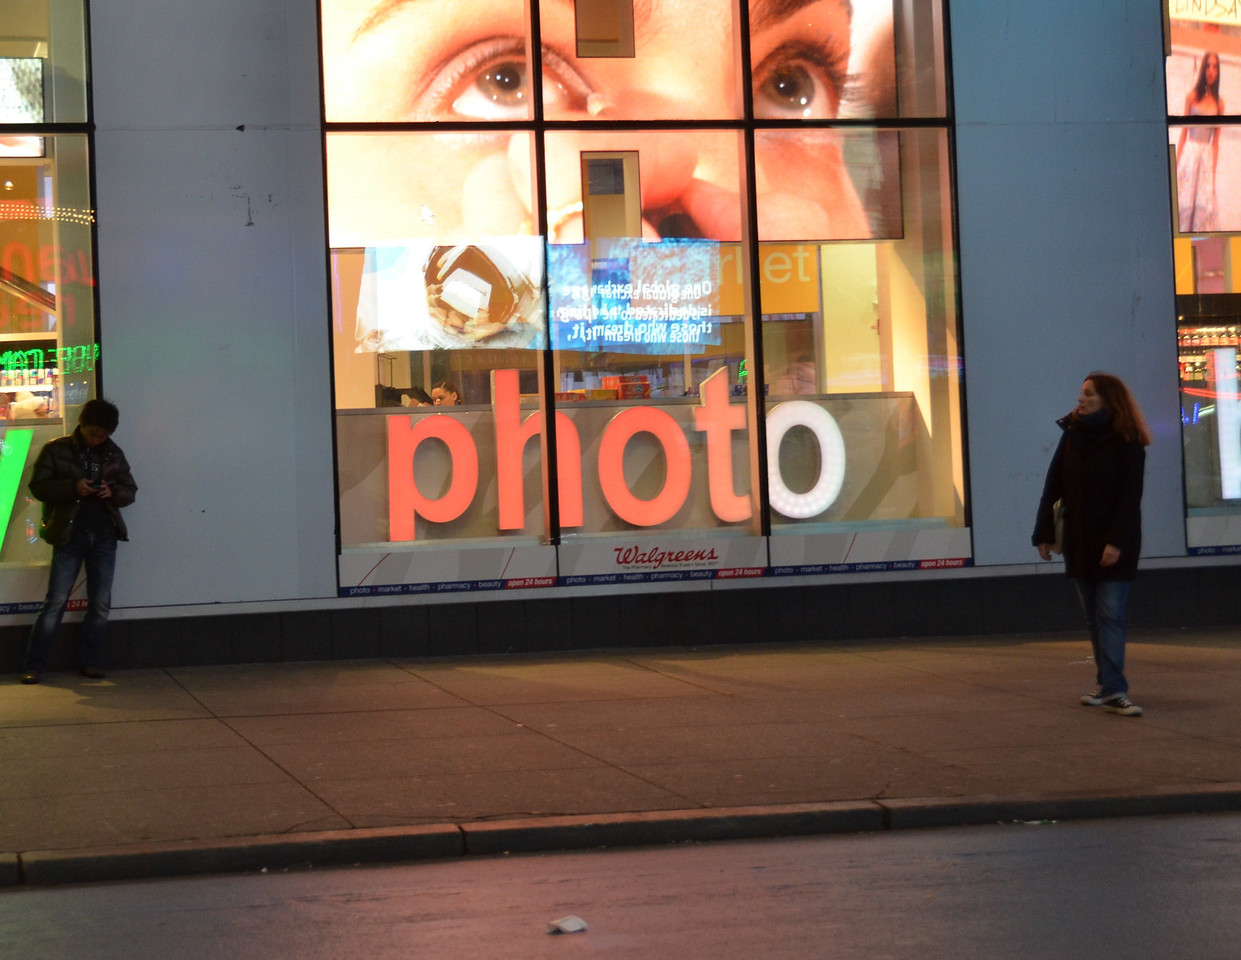 photo, Tiimes Square